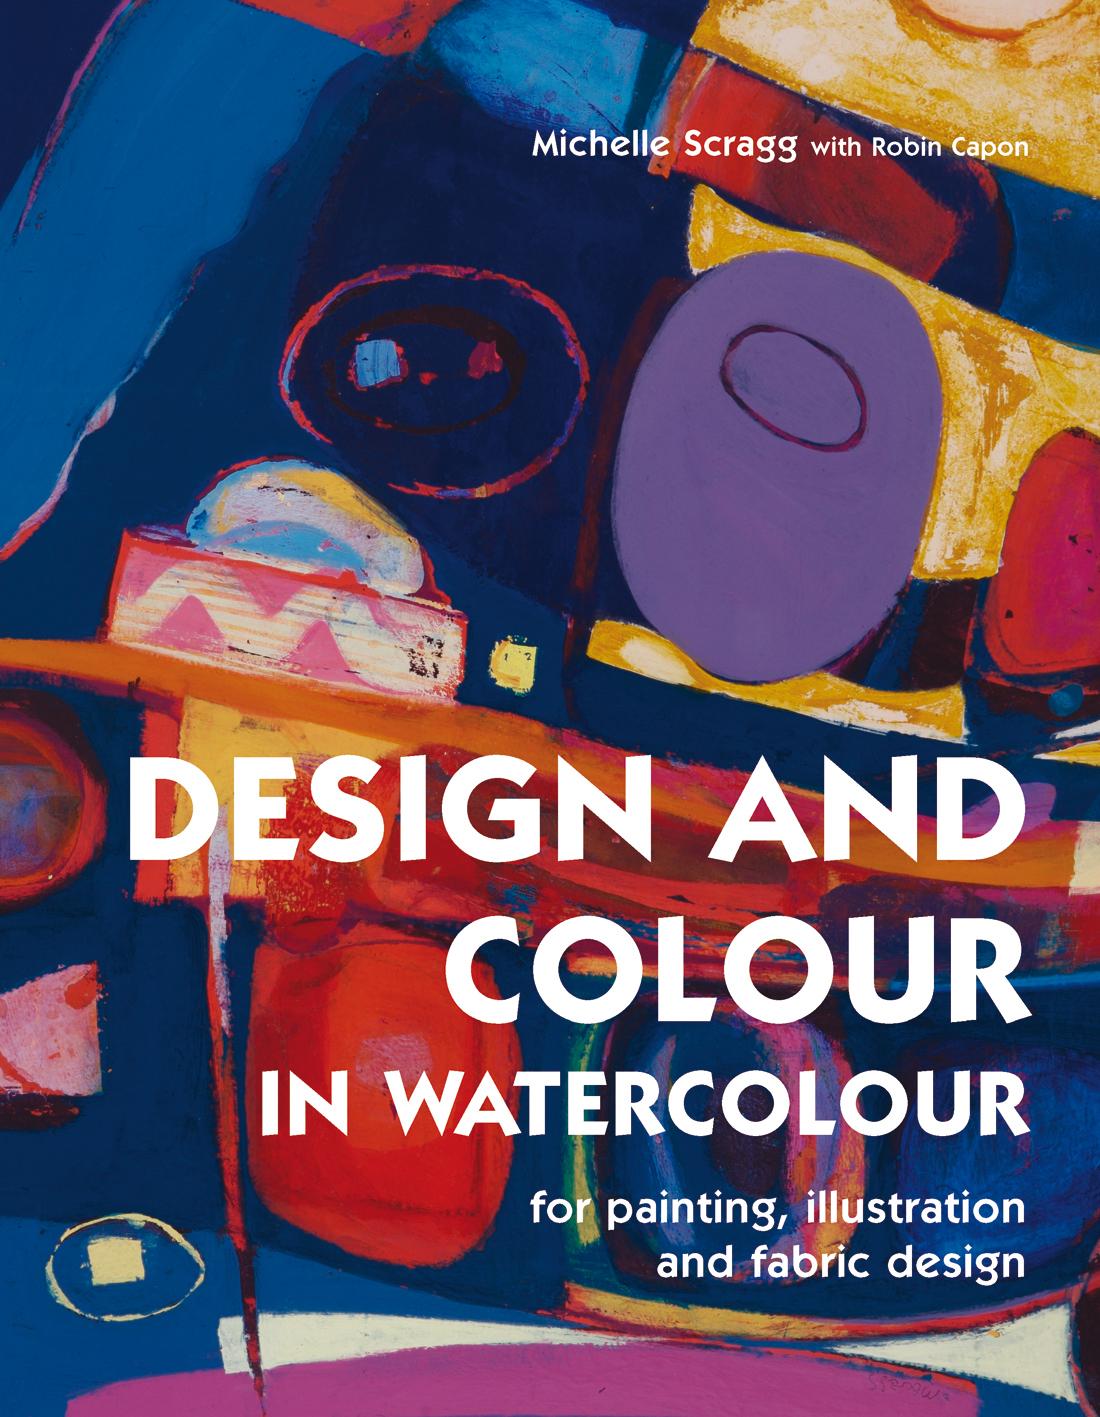 Design and Colour in Watercolour